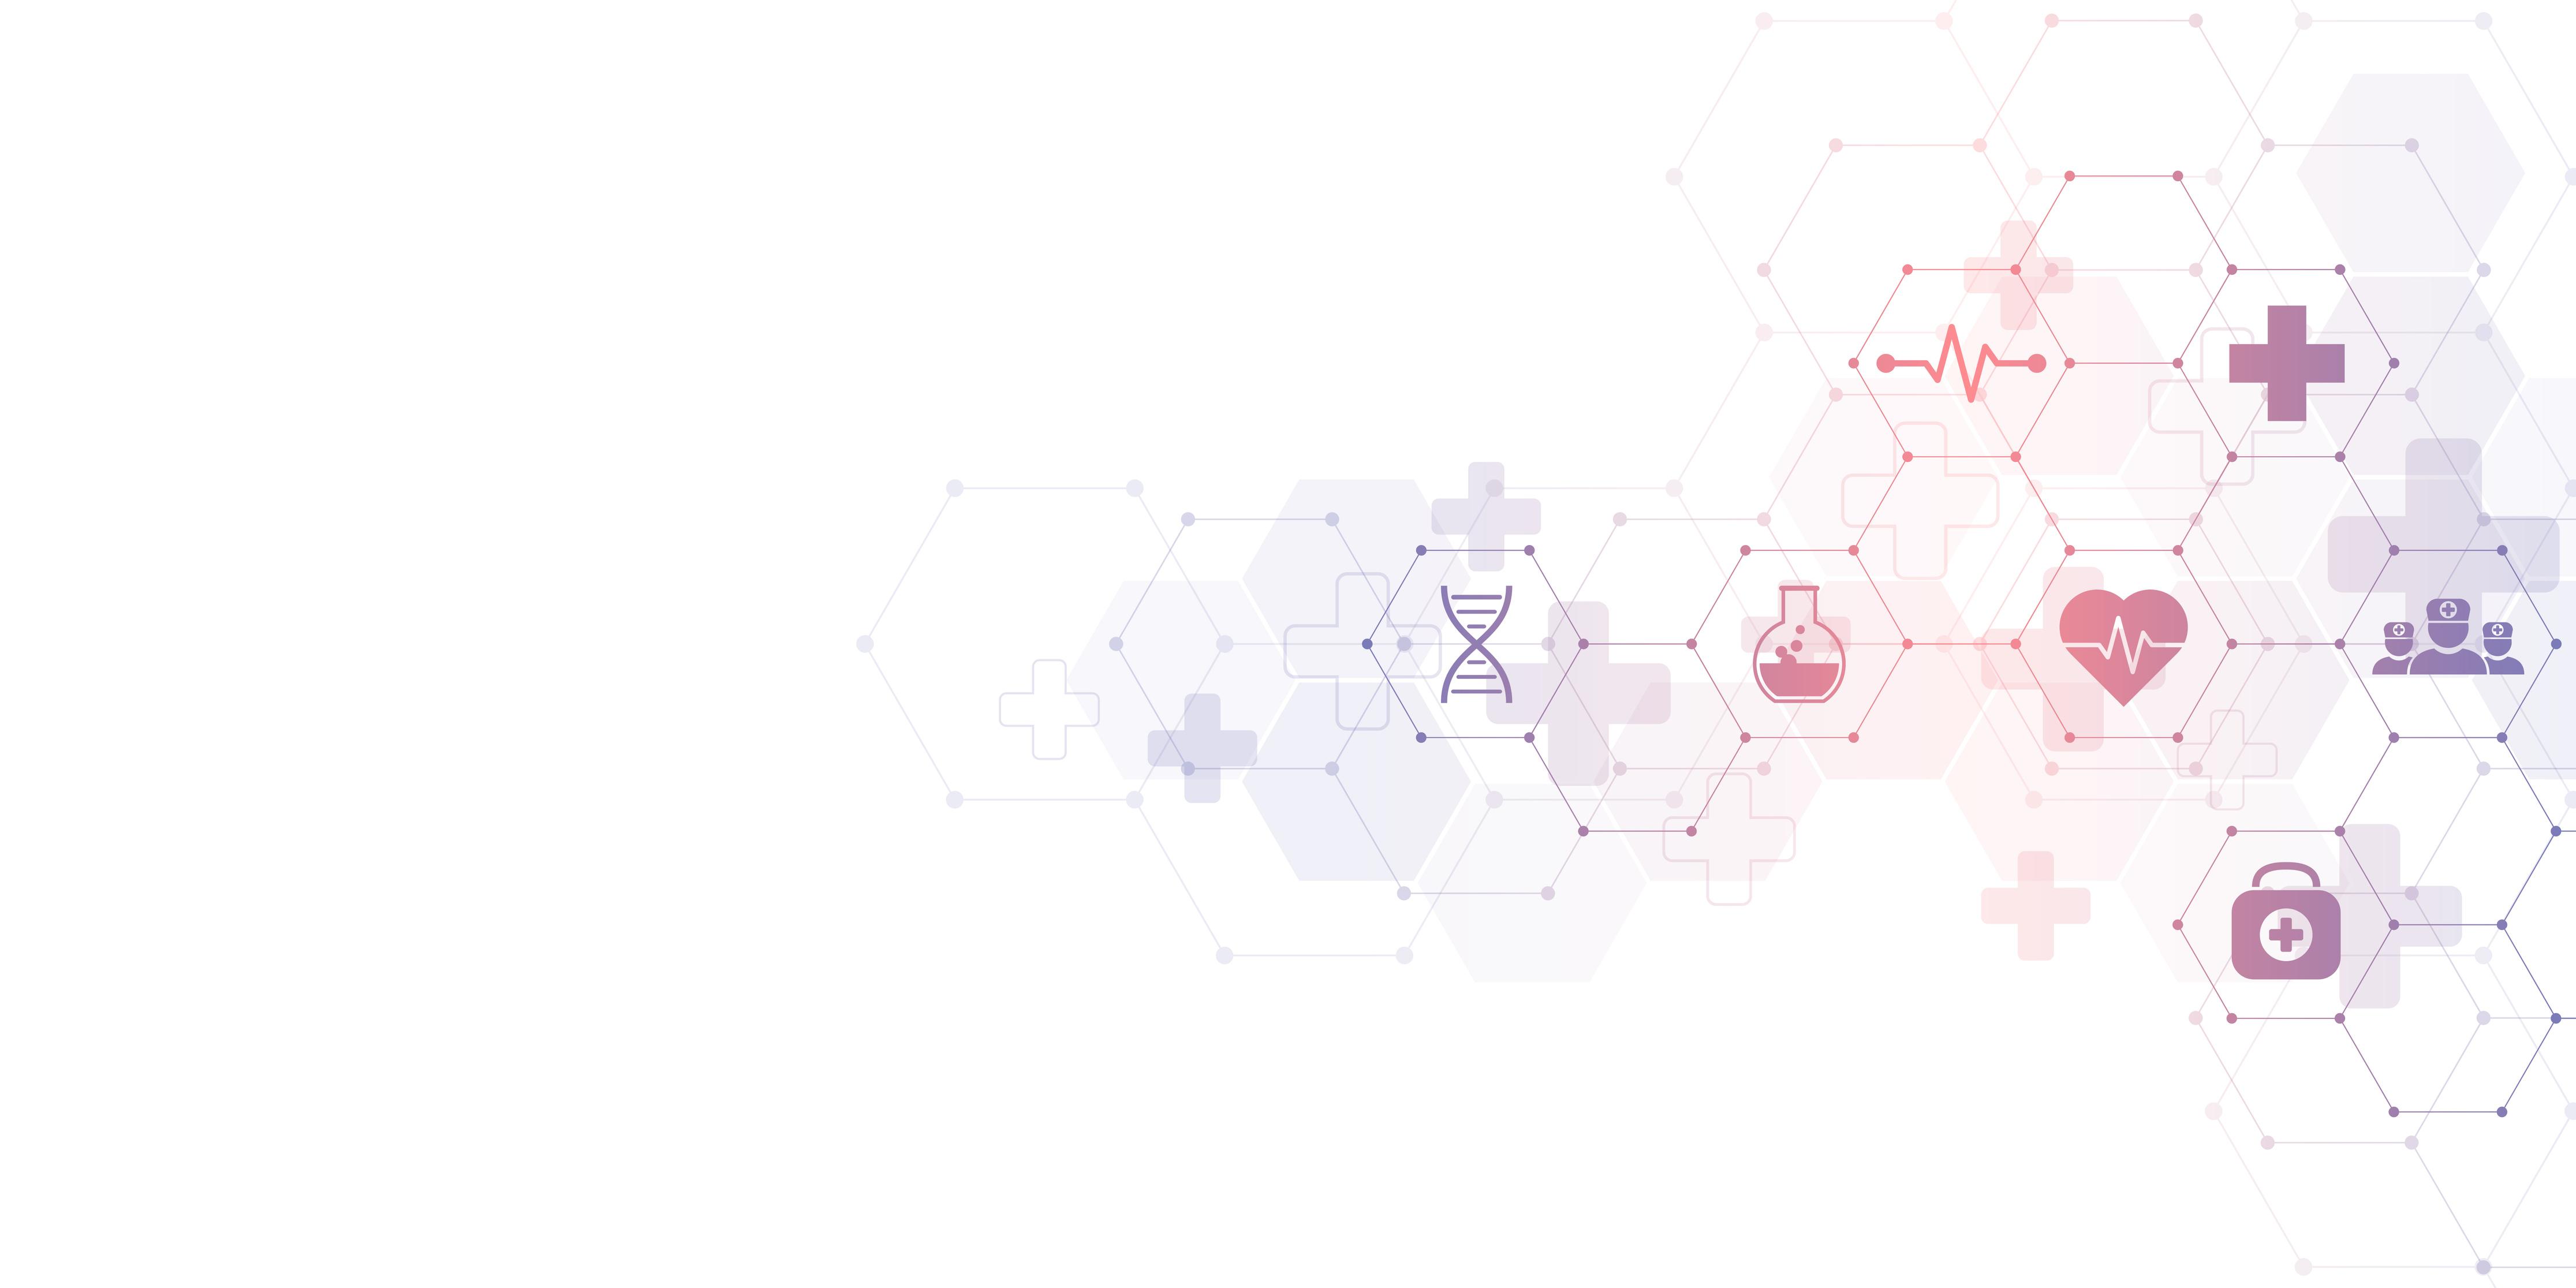 Revolutionizing Cancer Treatment through Genomics